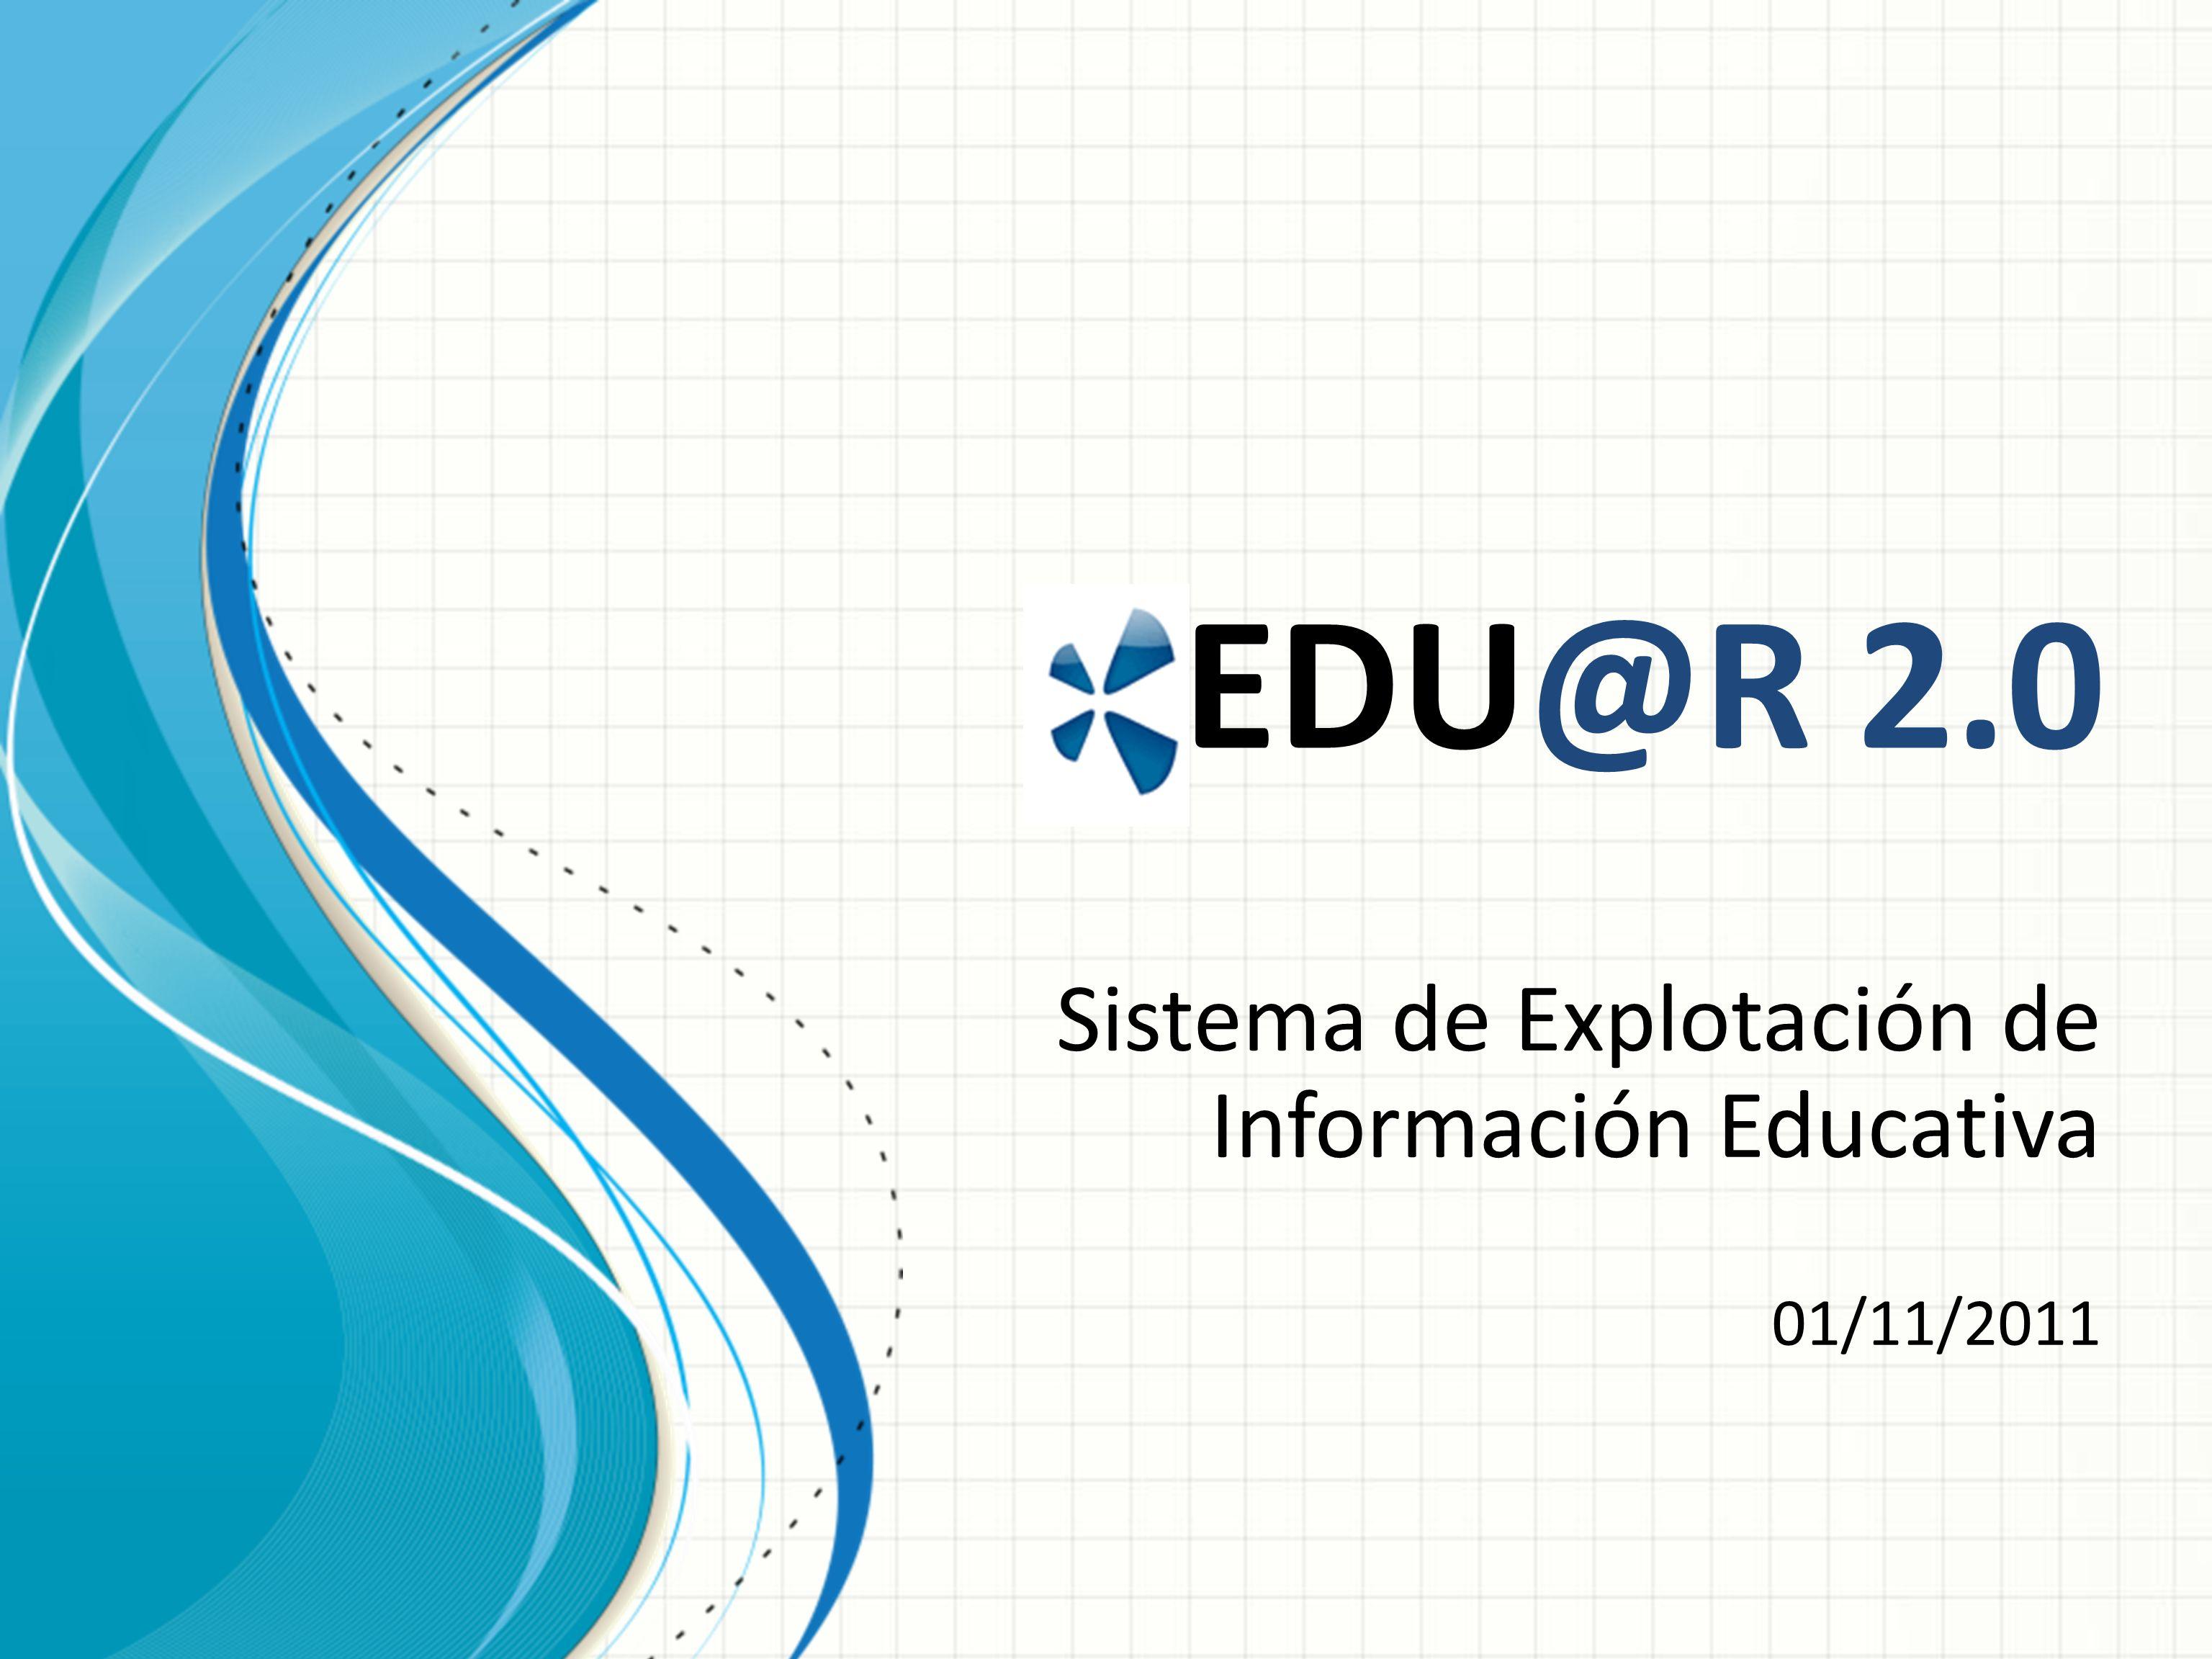 EDU@R 2.0 Sistema de Explotación de Información Educativa 01/11/2011